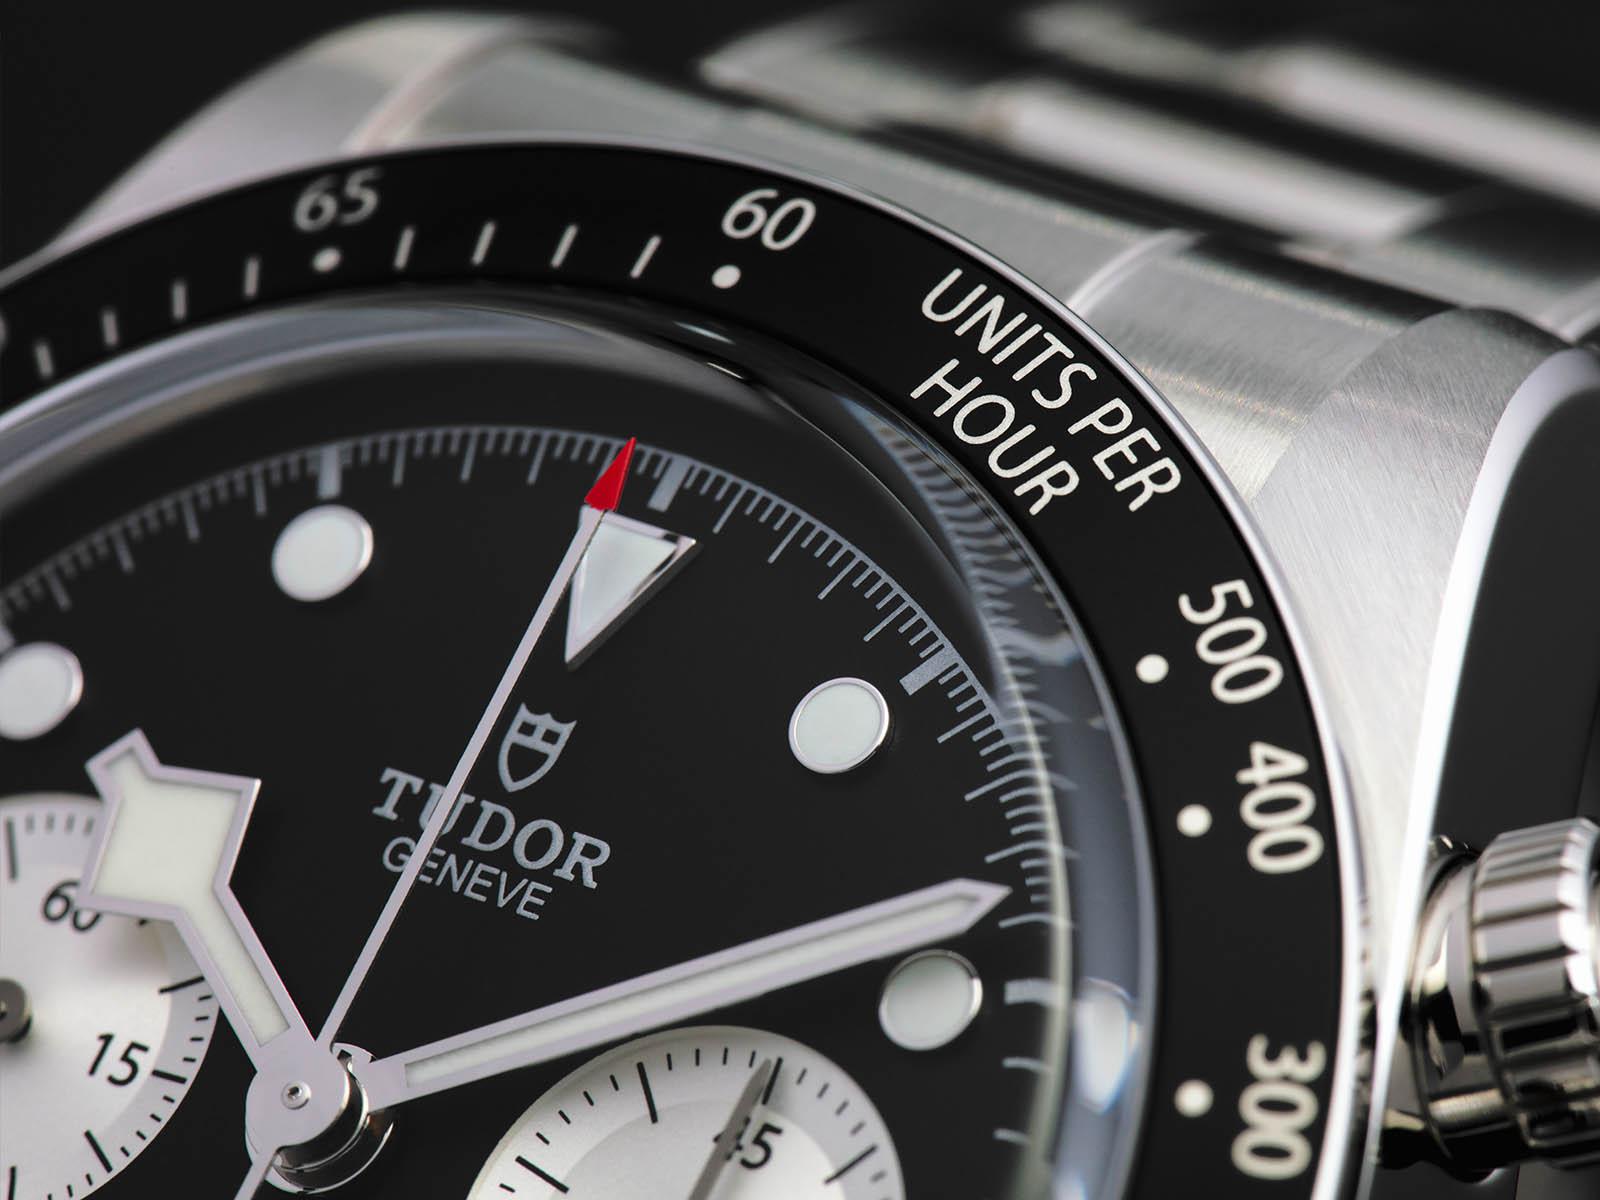 tudor-black-bay-chrono-review-4.jpg